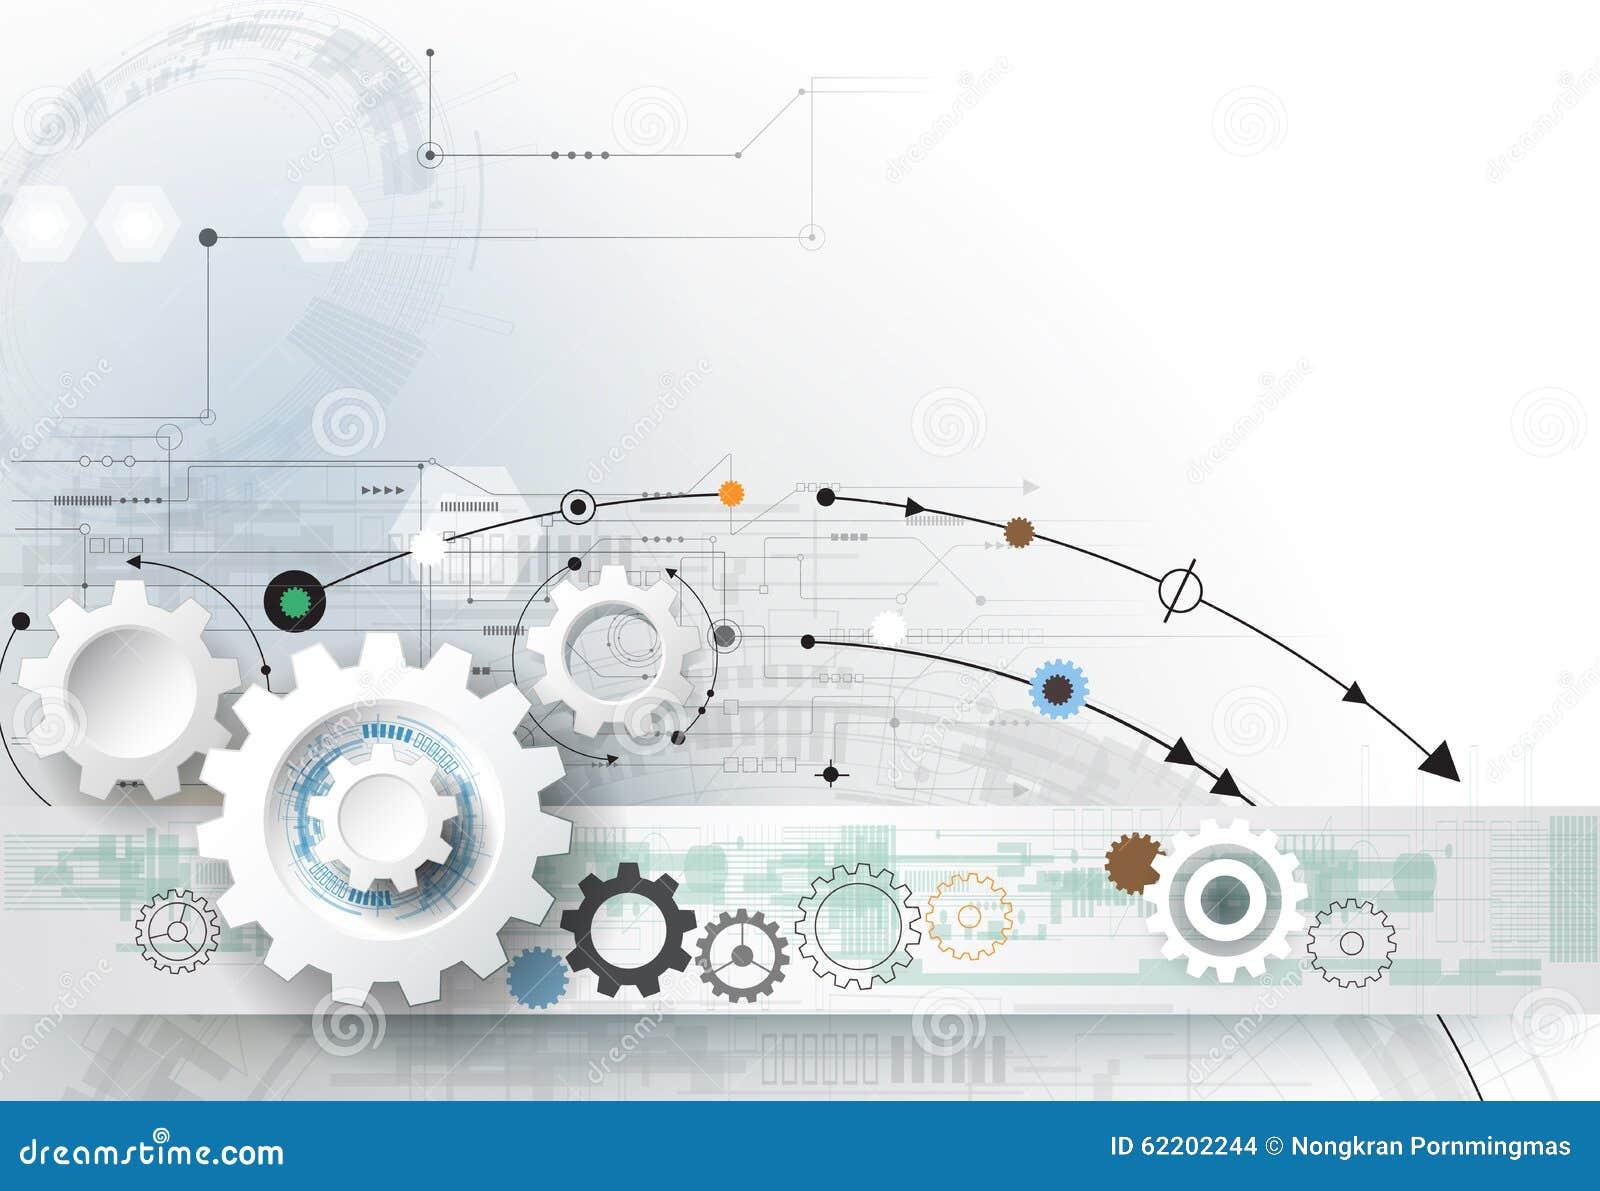 Vector illustration gear wheel, hexagons and circuit board, Hi-tech digital technology and engineering